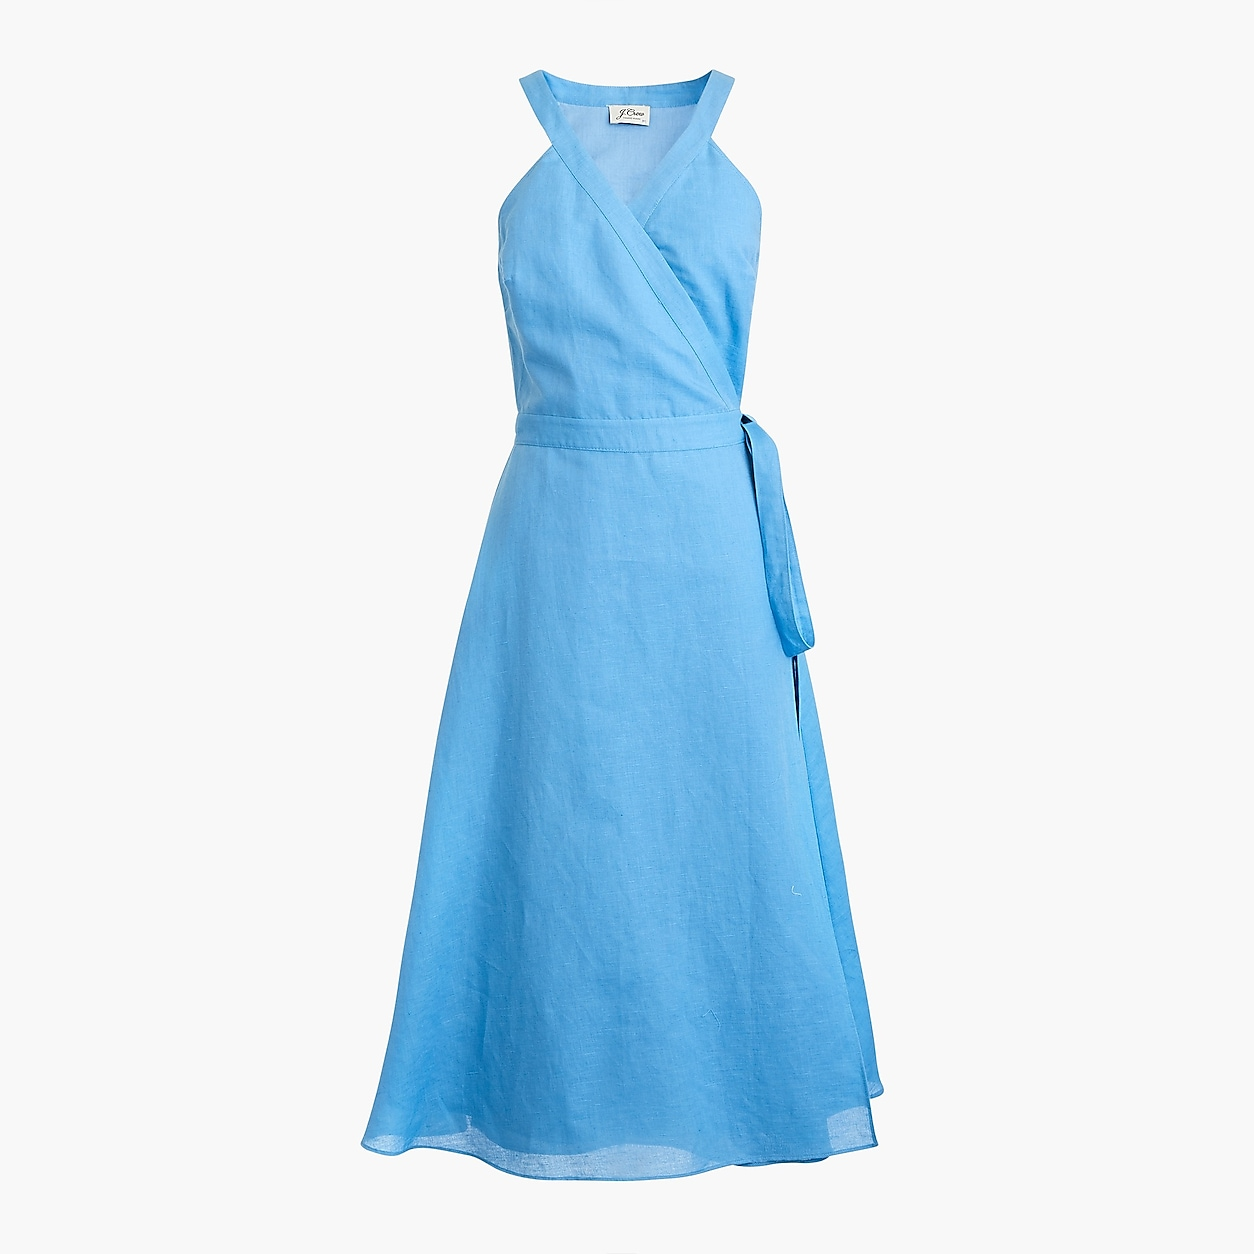 2d43b3d35f Linen Wrap Dress | Things to Wear | Dresses, Vacation dresses, Wrap ...